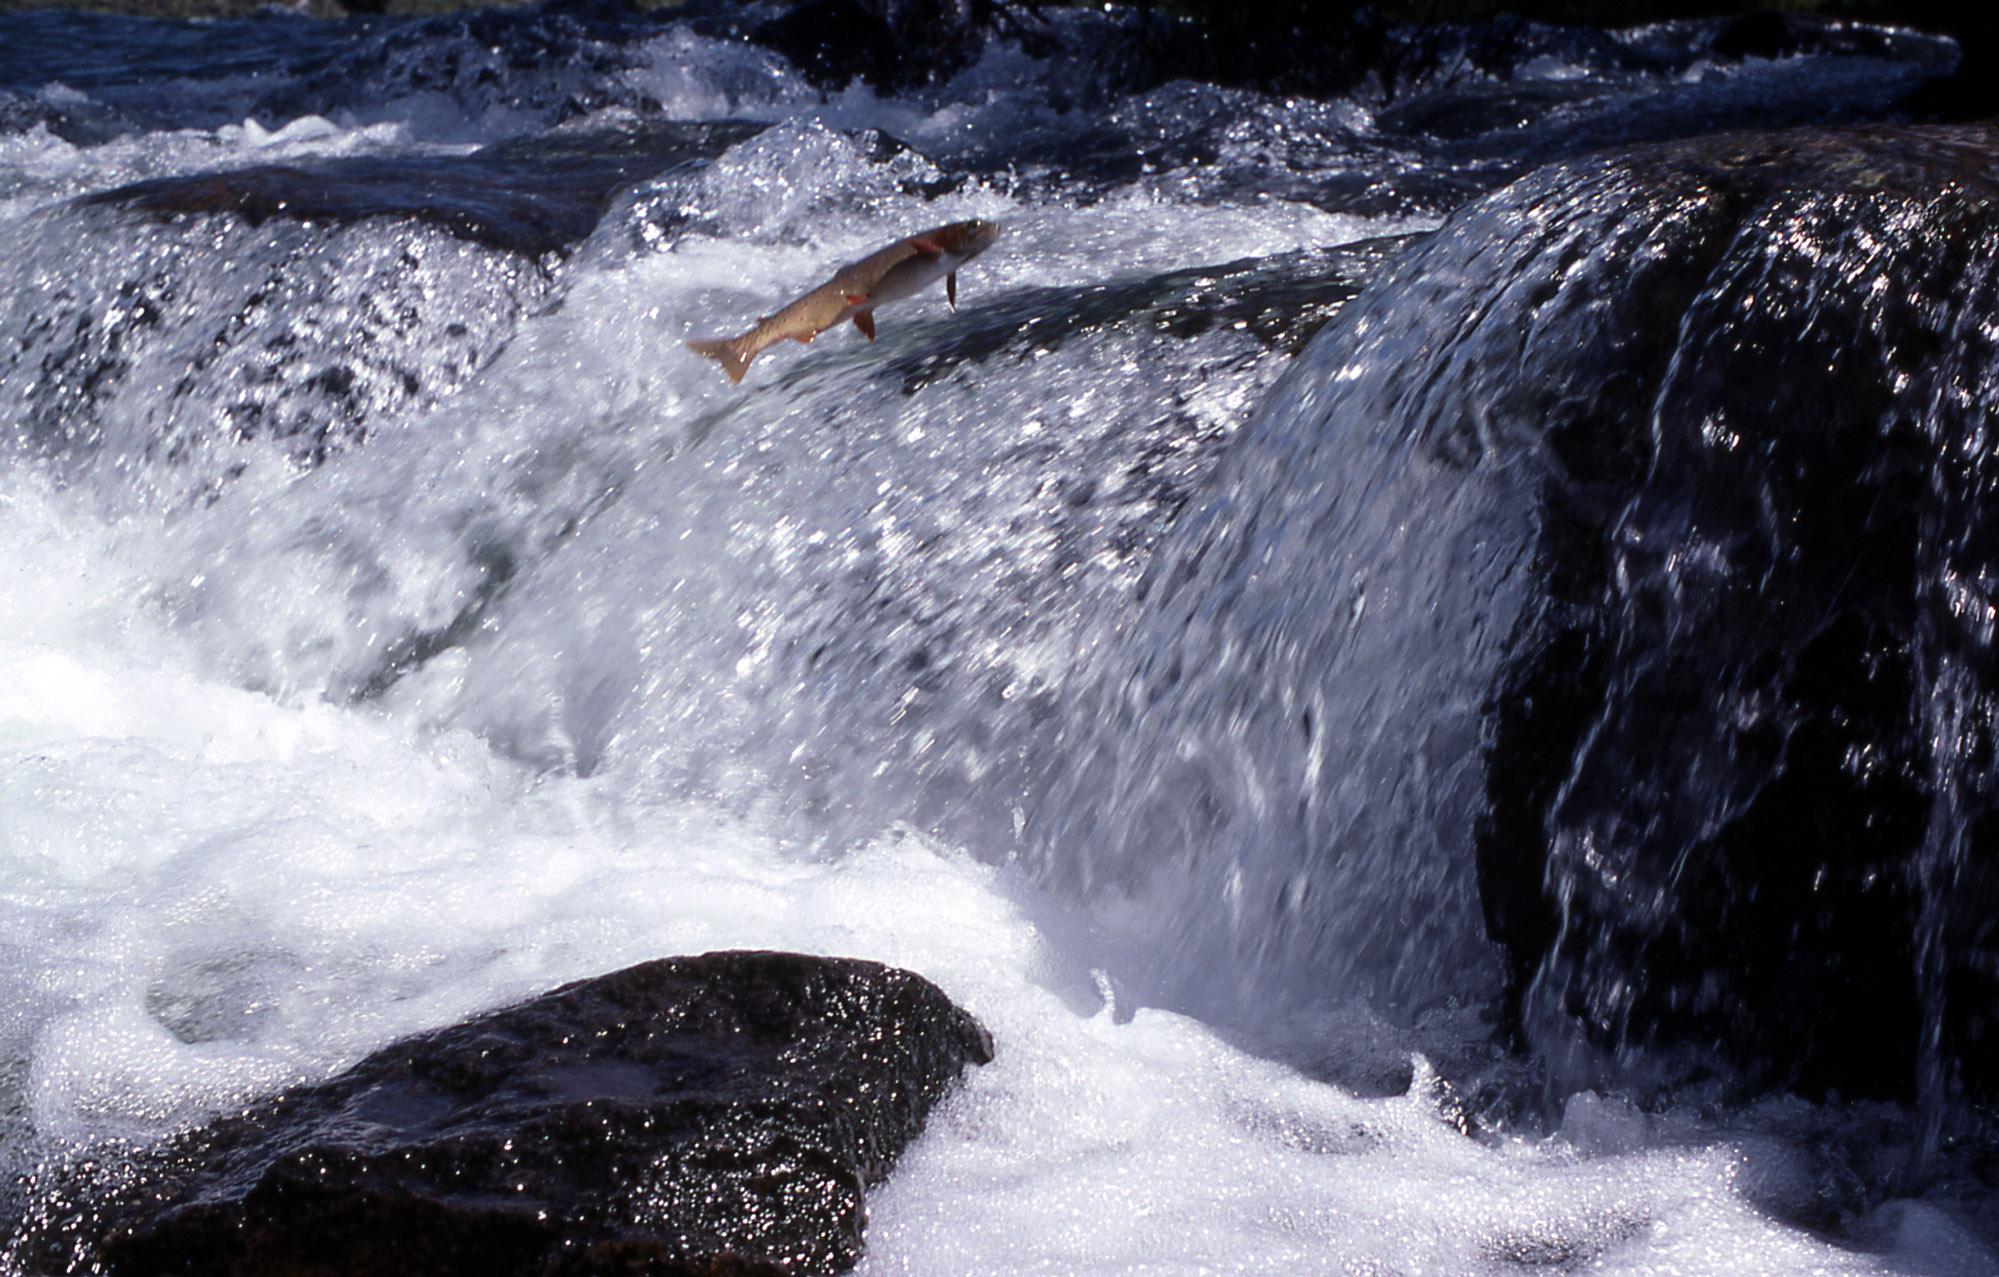 Cutthroat Trout leaping at LeHardy Rapids; Harlan Kredit; 1976